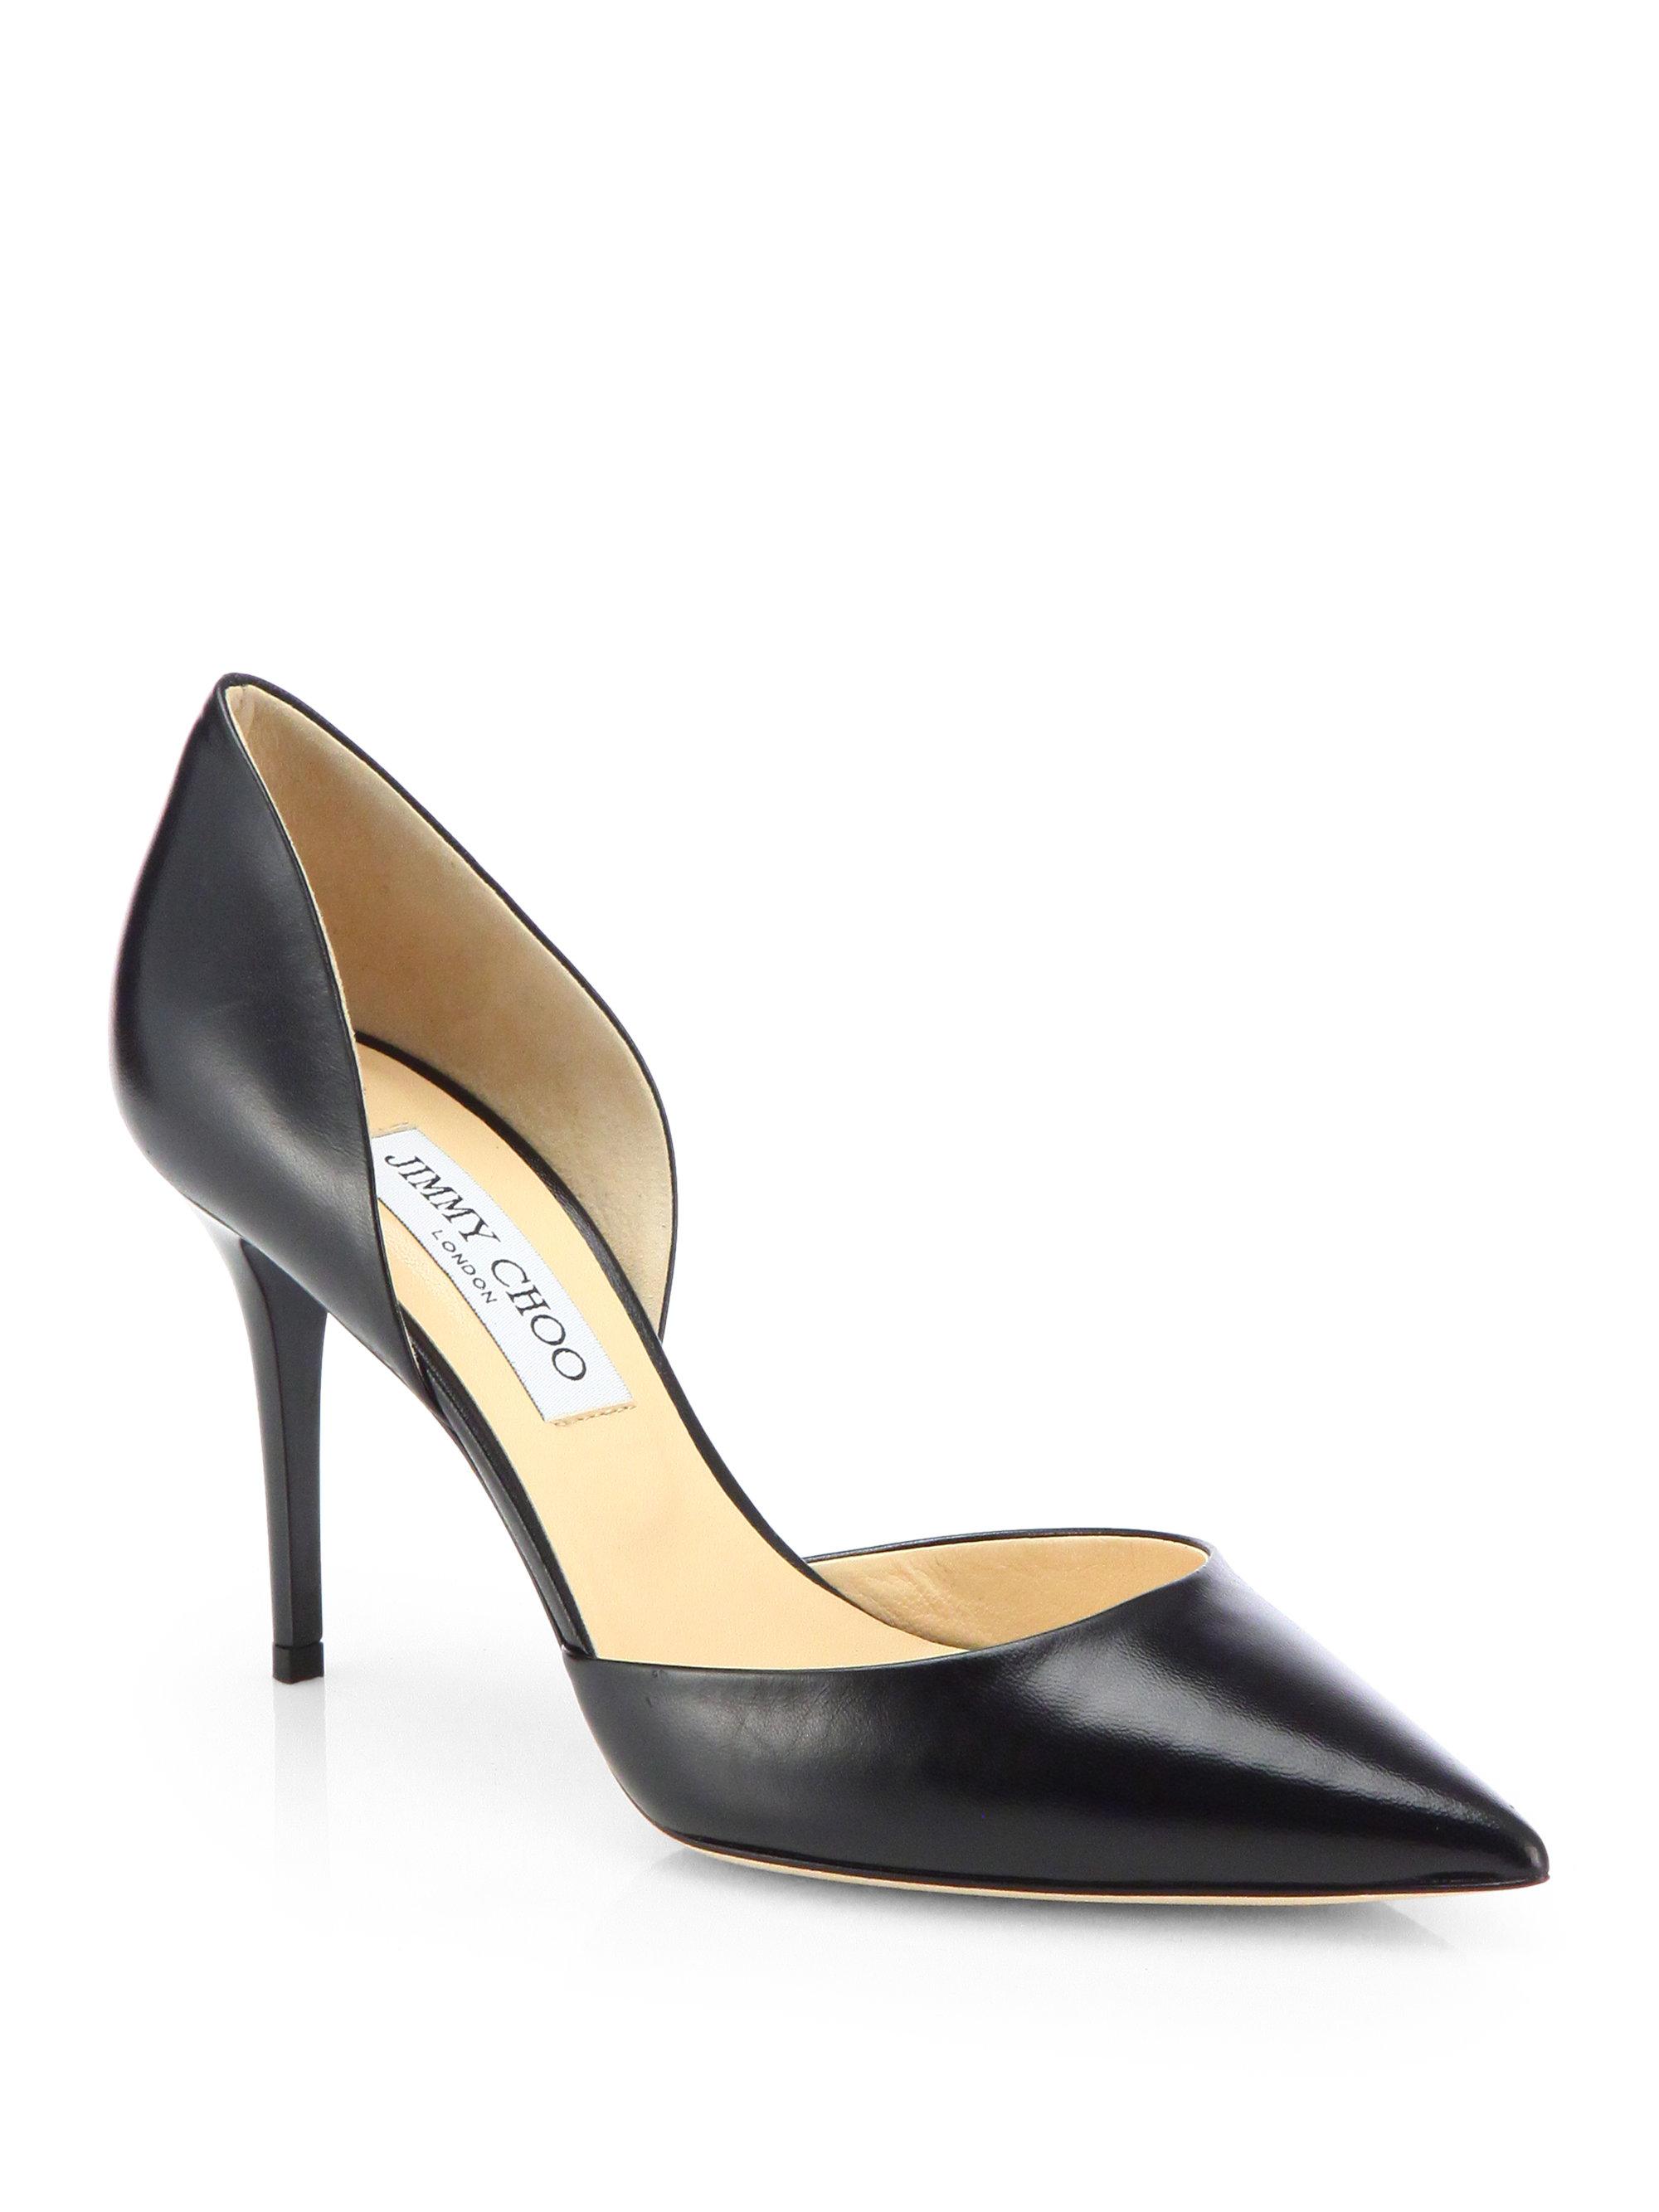 Saks Womens Shoes Sale